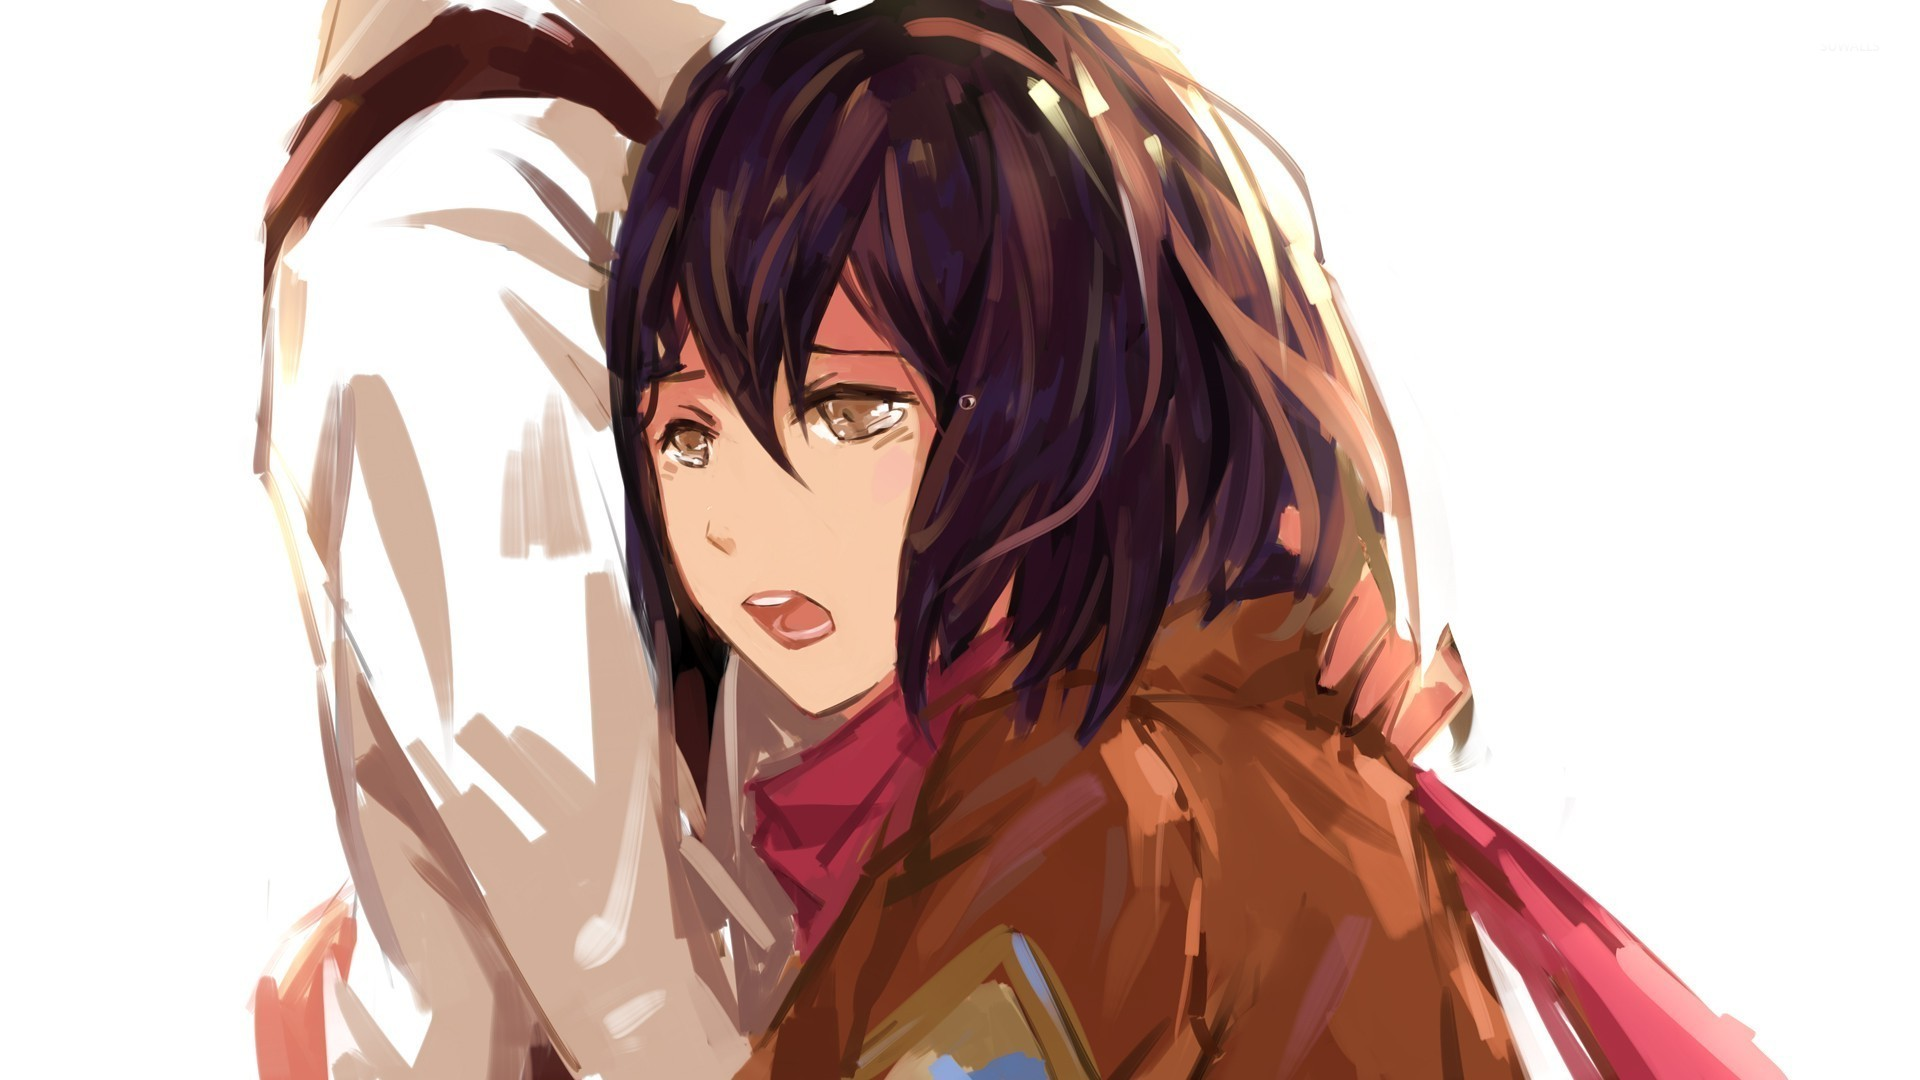 Mikasa Attack On Titan Wallpaper 4k 1920x1080 Download Hd Wallpaper Wallpapertip